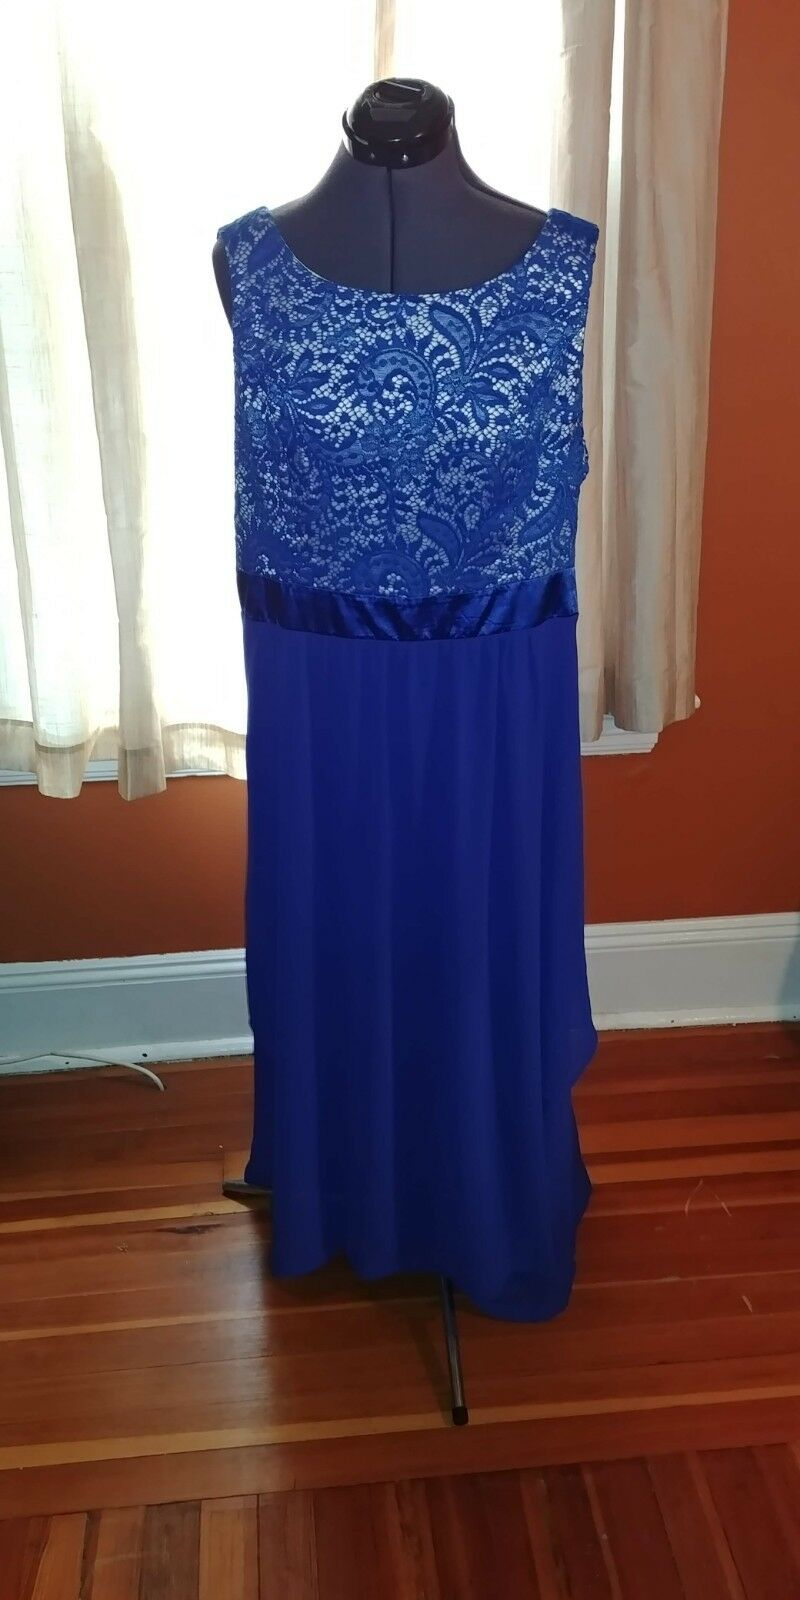 Woherren Royal Blau Empire Waist Dress Full Length